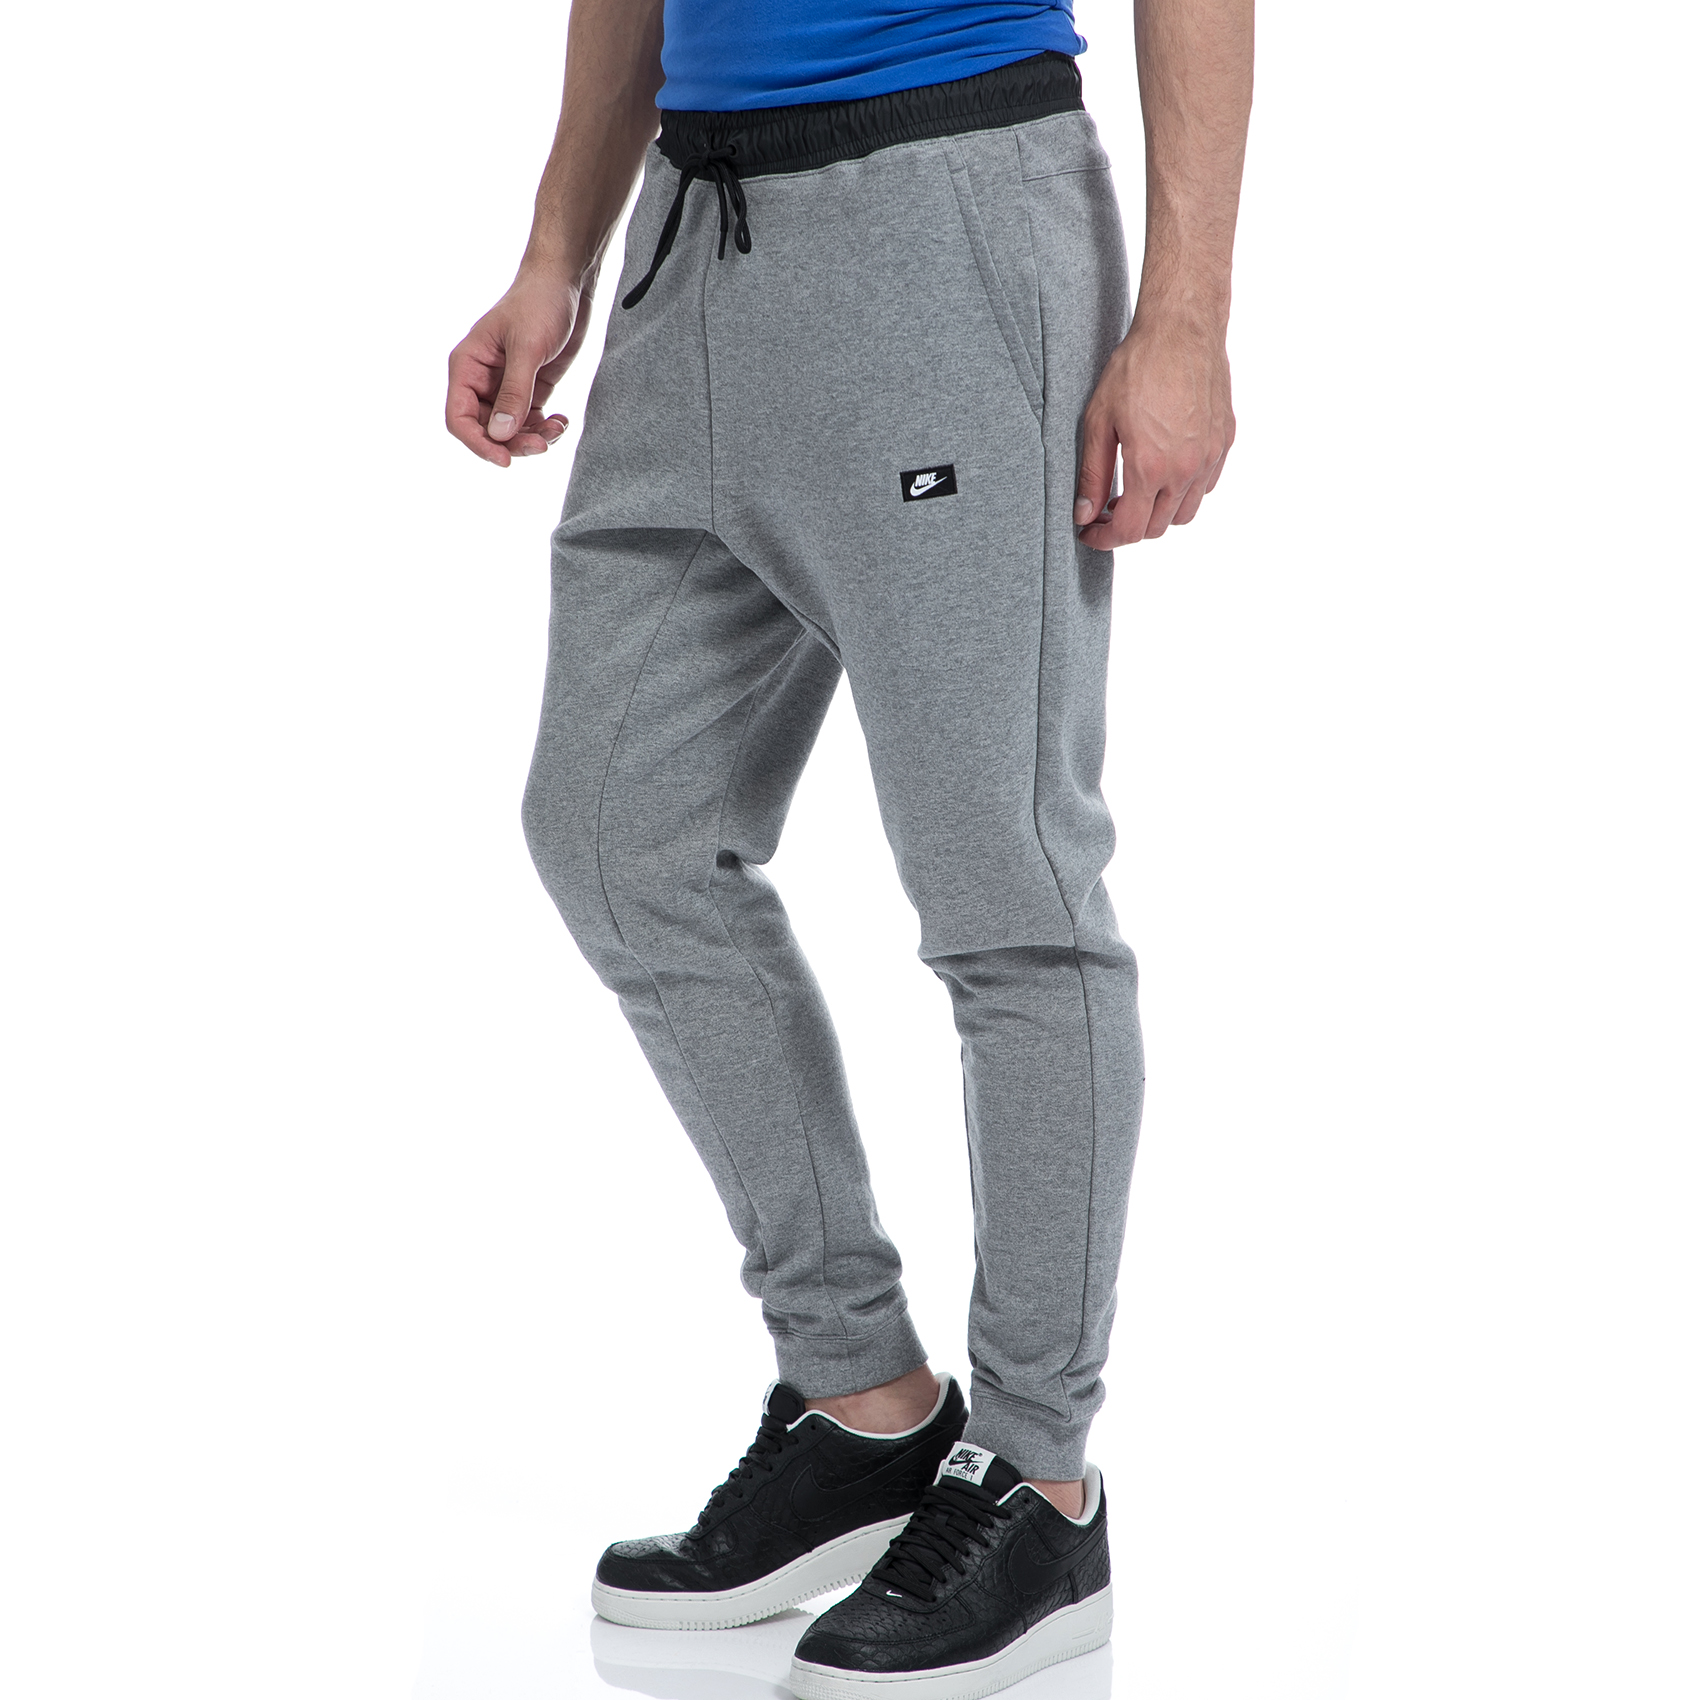 a417756a87c NIKE - Αντρικό παντελόνι φόρμας NIKE γκρι, Ανδρικές αθλητικές φόρμες,  ΑΝΔΡΑΣ | ΡΟΥΧΑ | ΦΟΡΜΕΣ